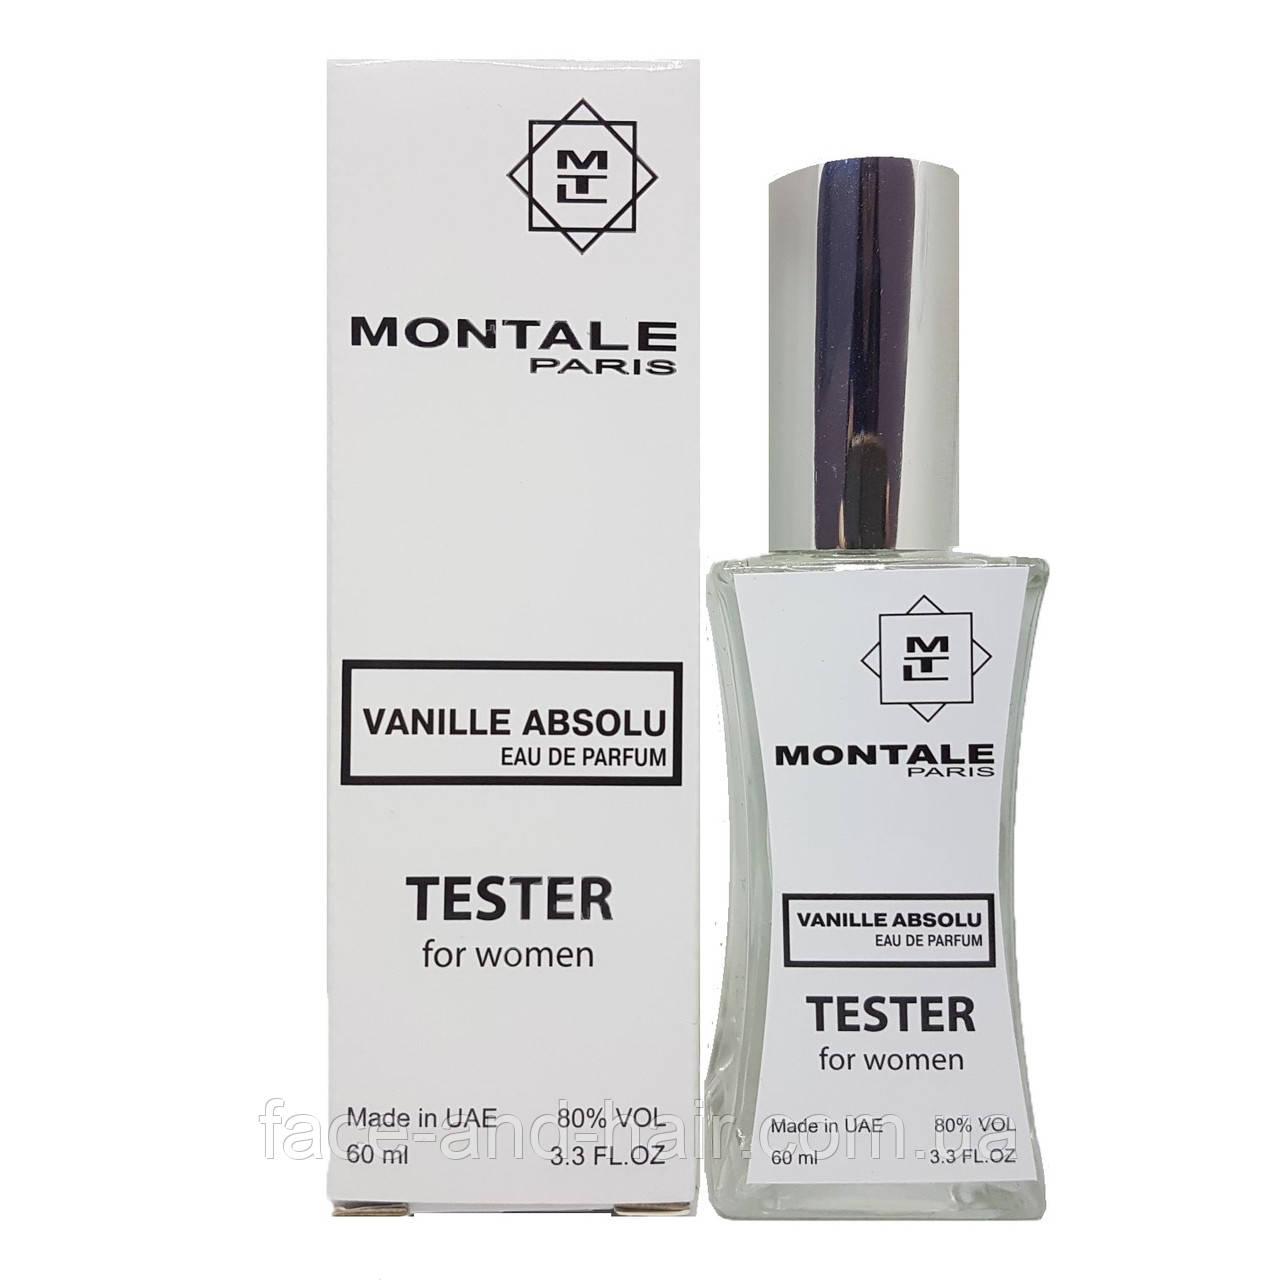 Montale Vanille Absolu - Tester 60ml